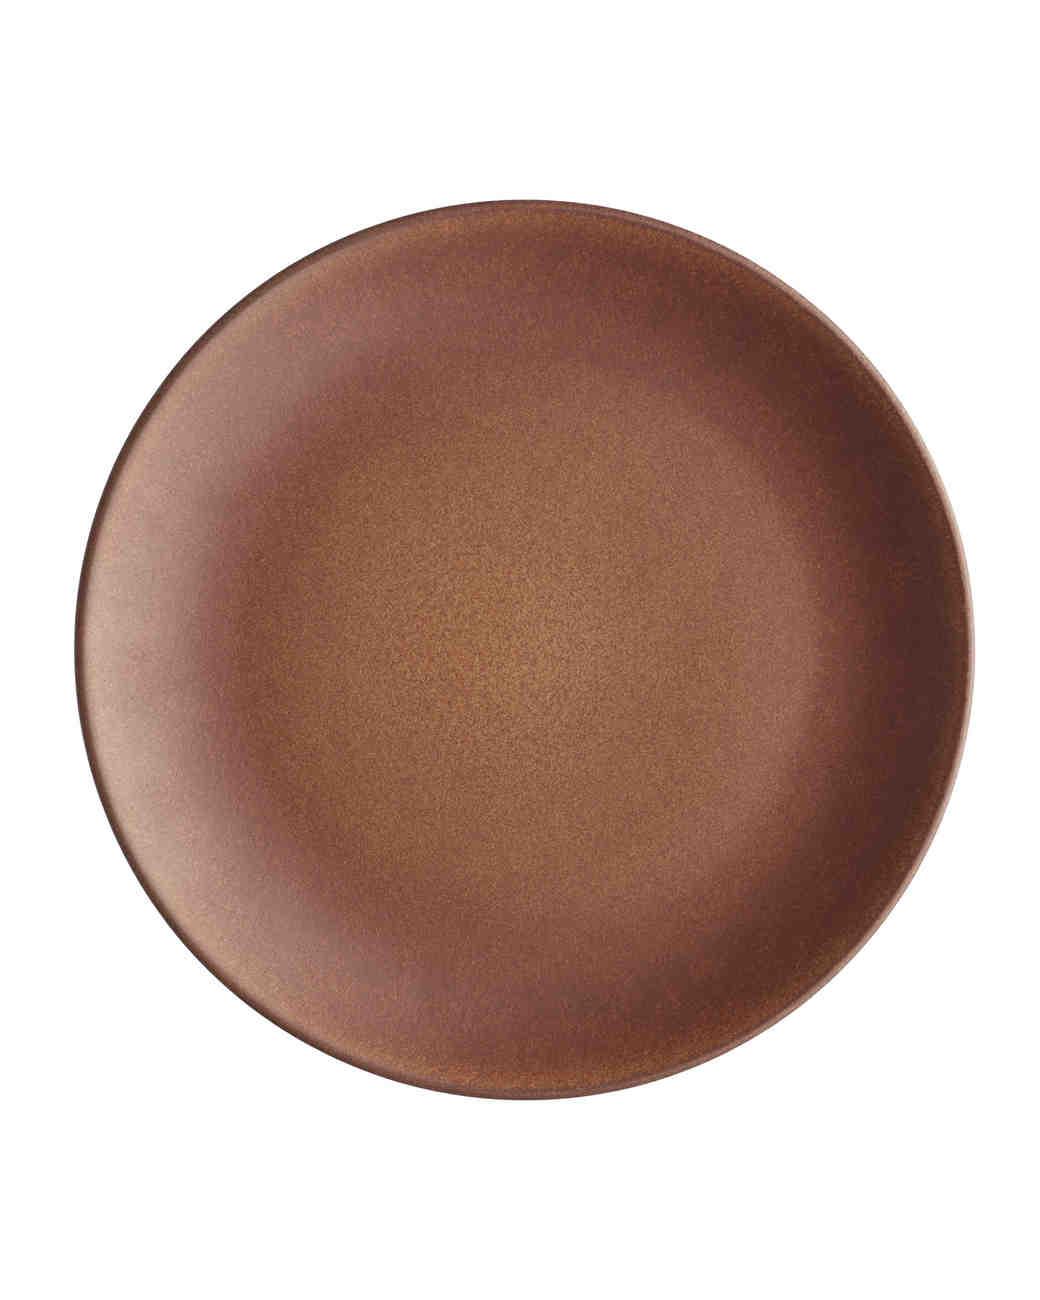 china-registry-global-clare-vivier-heath-coupe-dinner-plate-redwood-1014.jpg